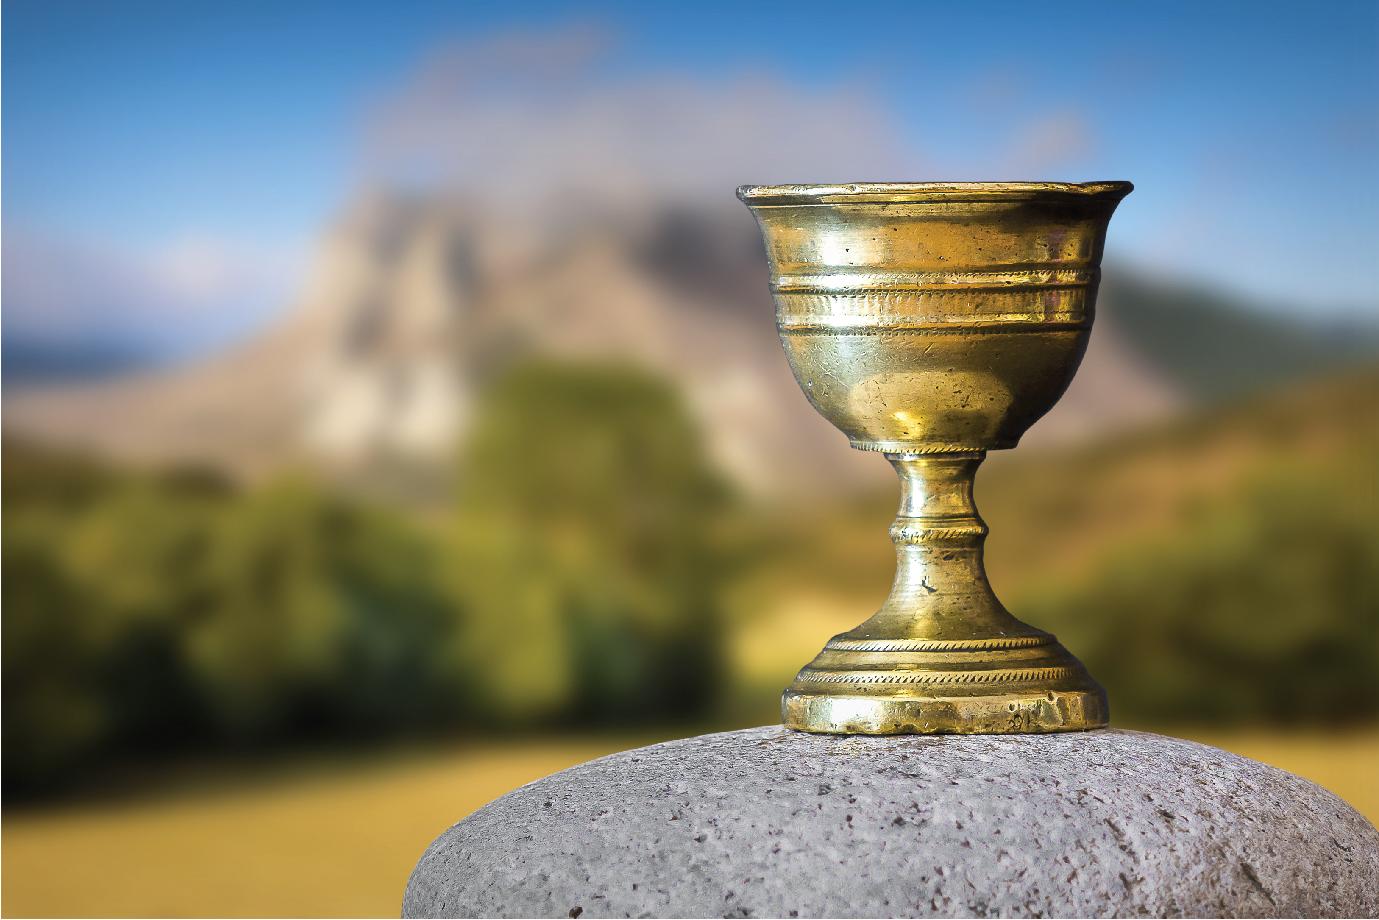 A gold goblet a top a rock